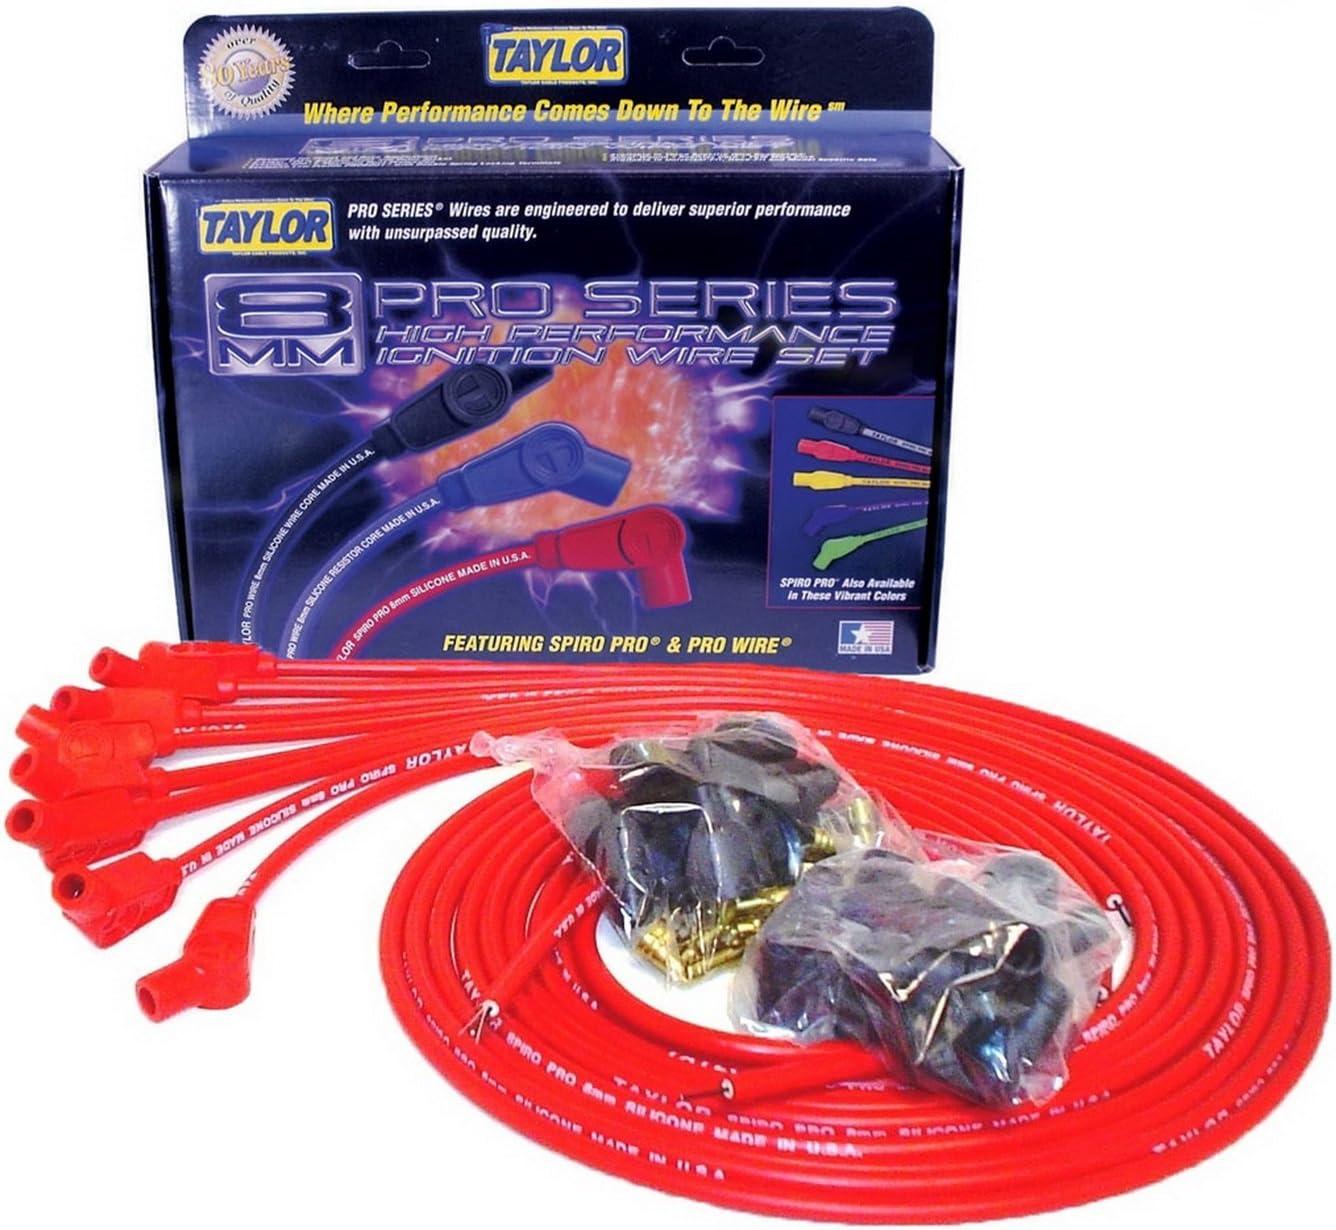 Taylor 73253 Spiro-Pro Spark Plug Wires 8mm